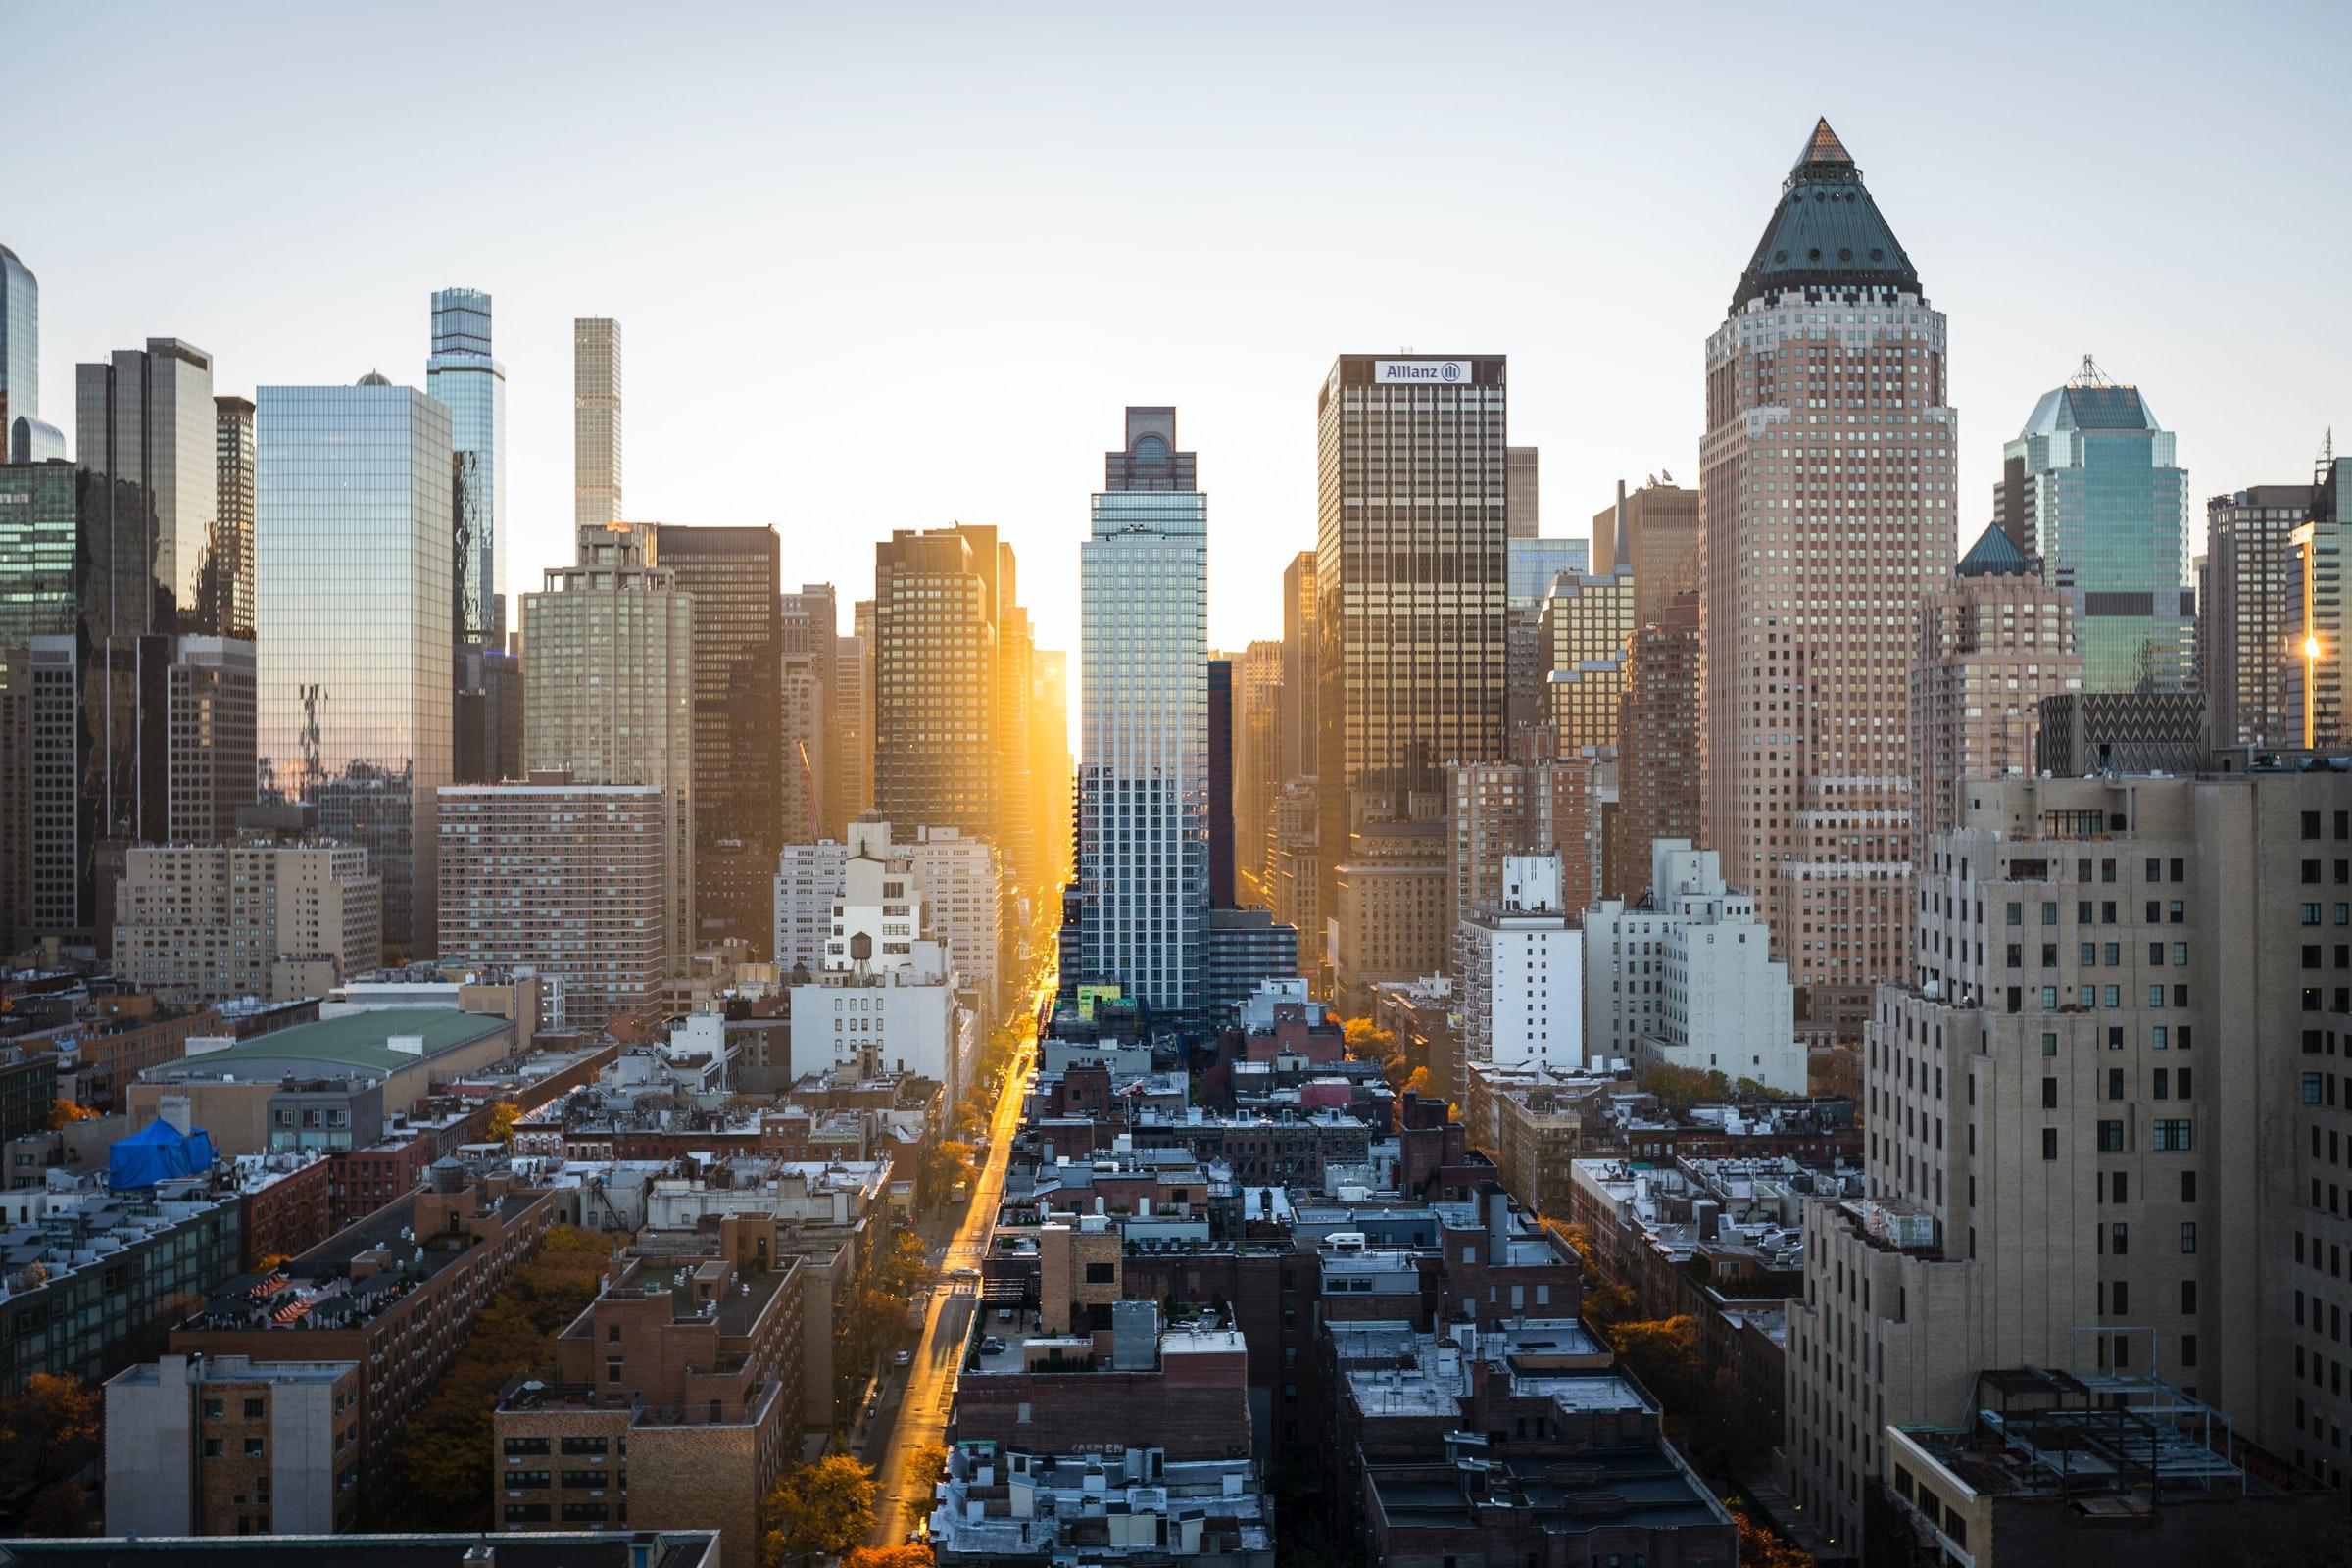 A skyline of New York